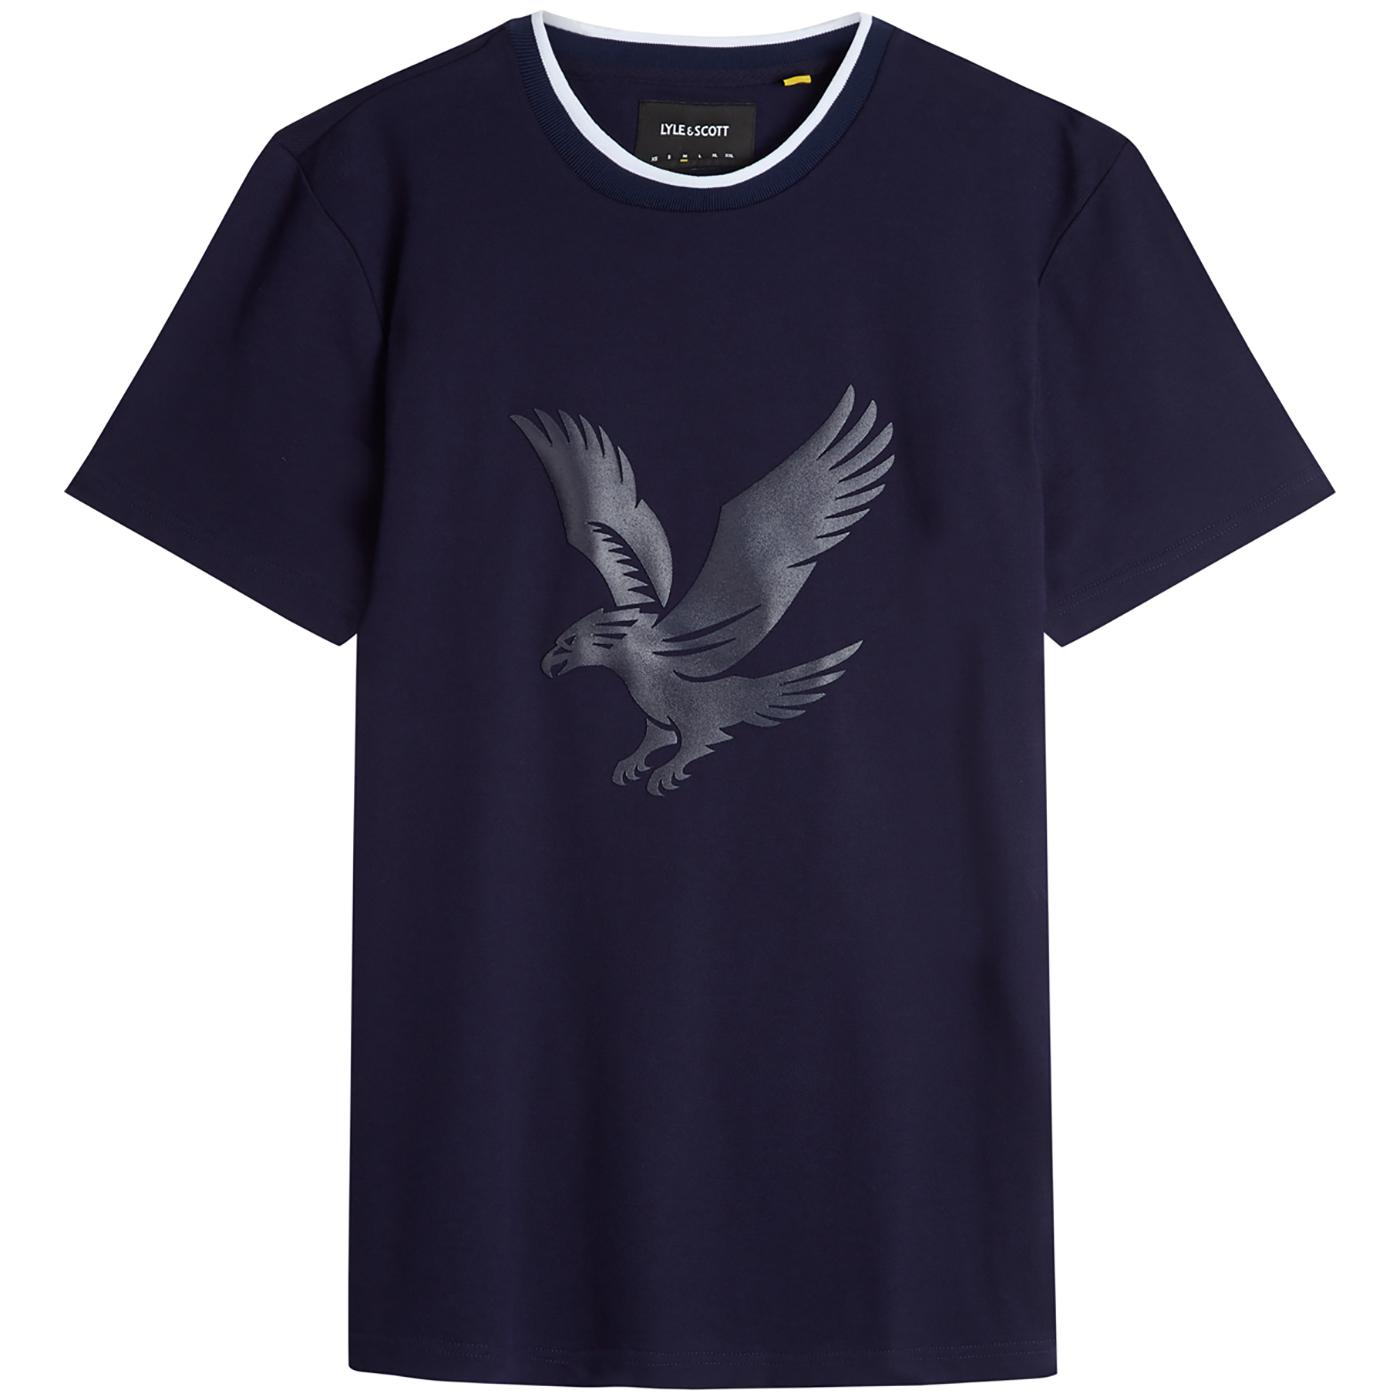 LYLE & SCOTT Casuals Eagle Logo Pique Tee (Navy)